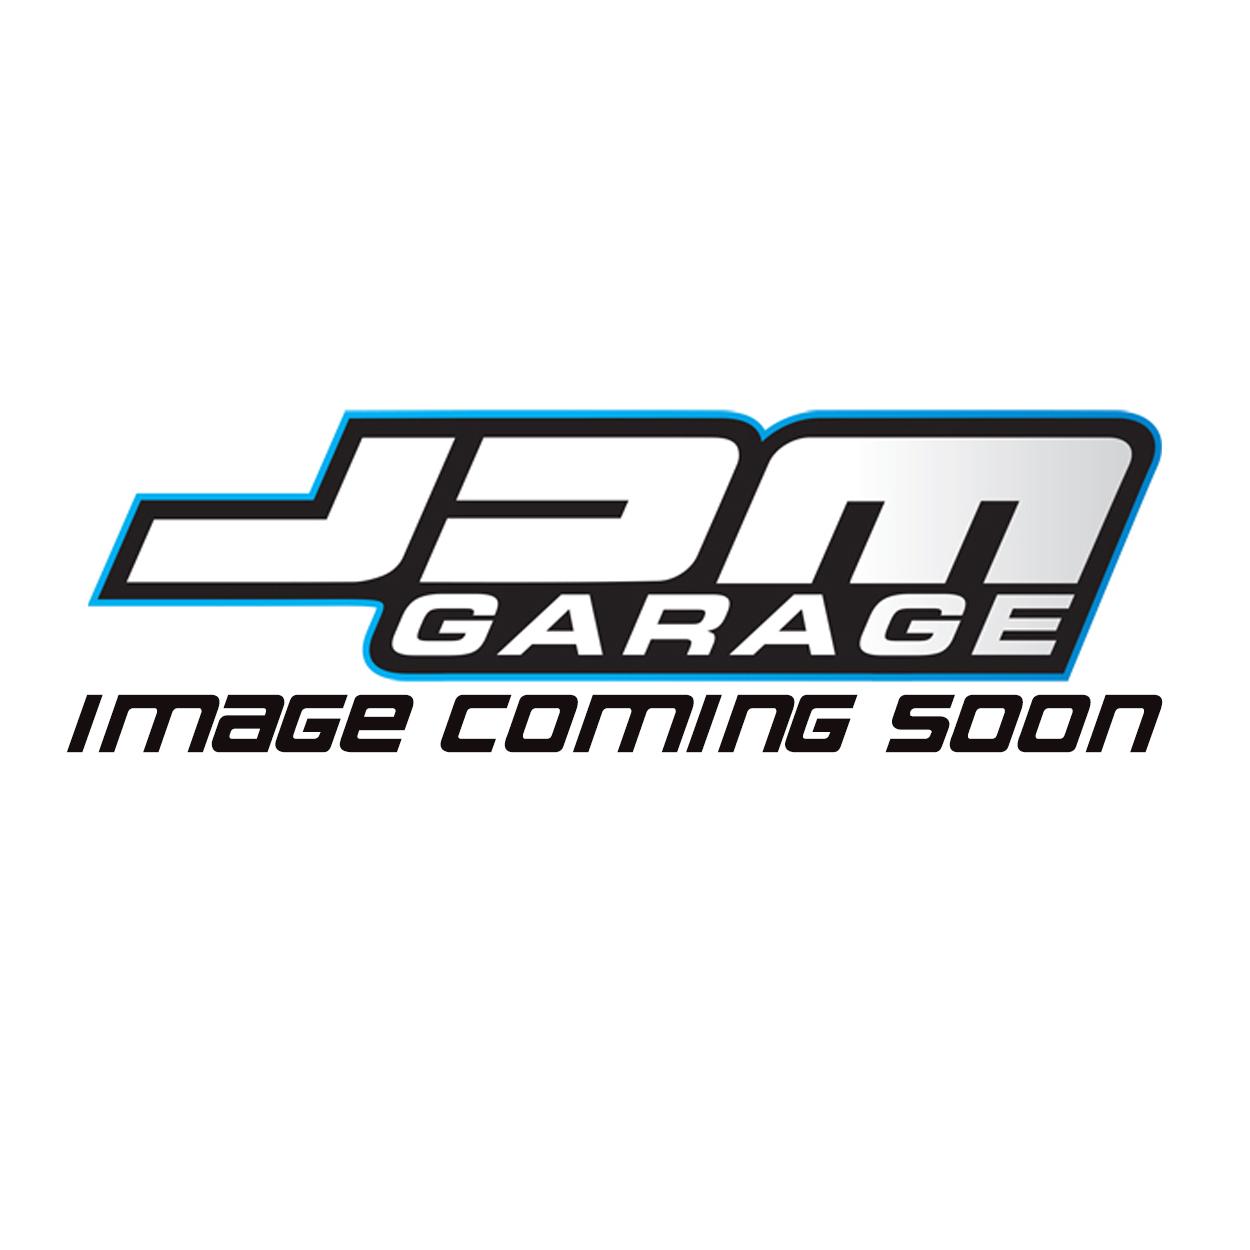 Haltech Elite 1000+ ECU Nissan Silvia PS13 S13 180SX SR20DET With Plug 'n' Play Adaptor Harness Kit